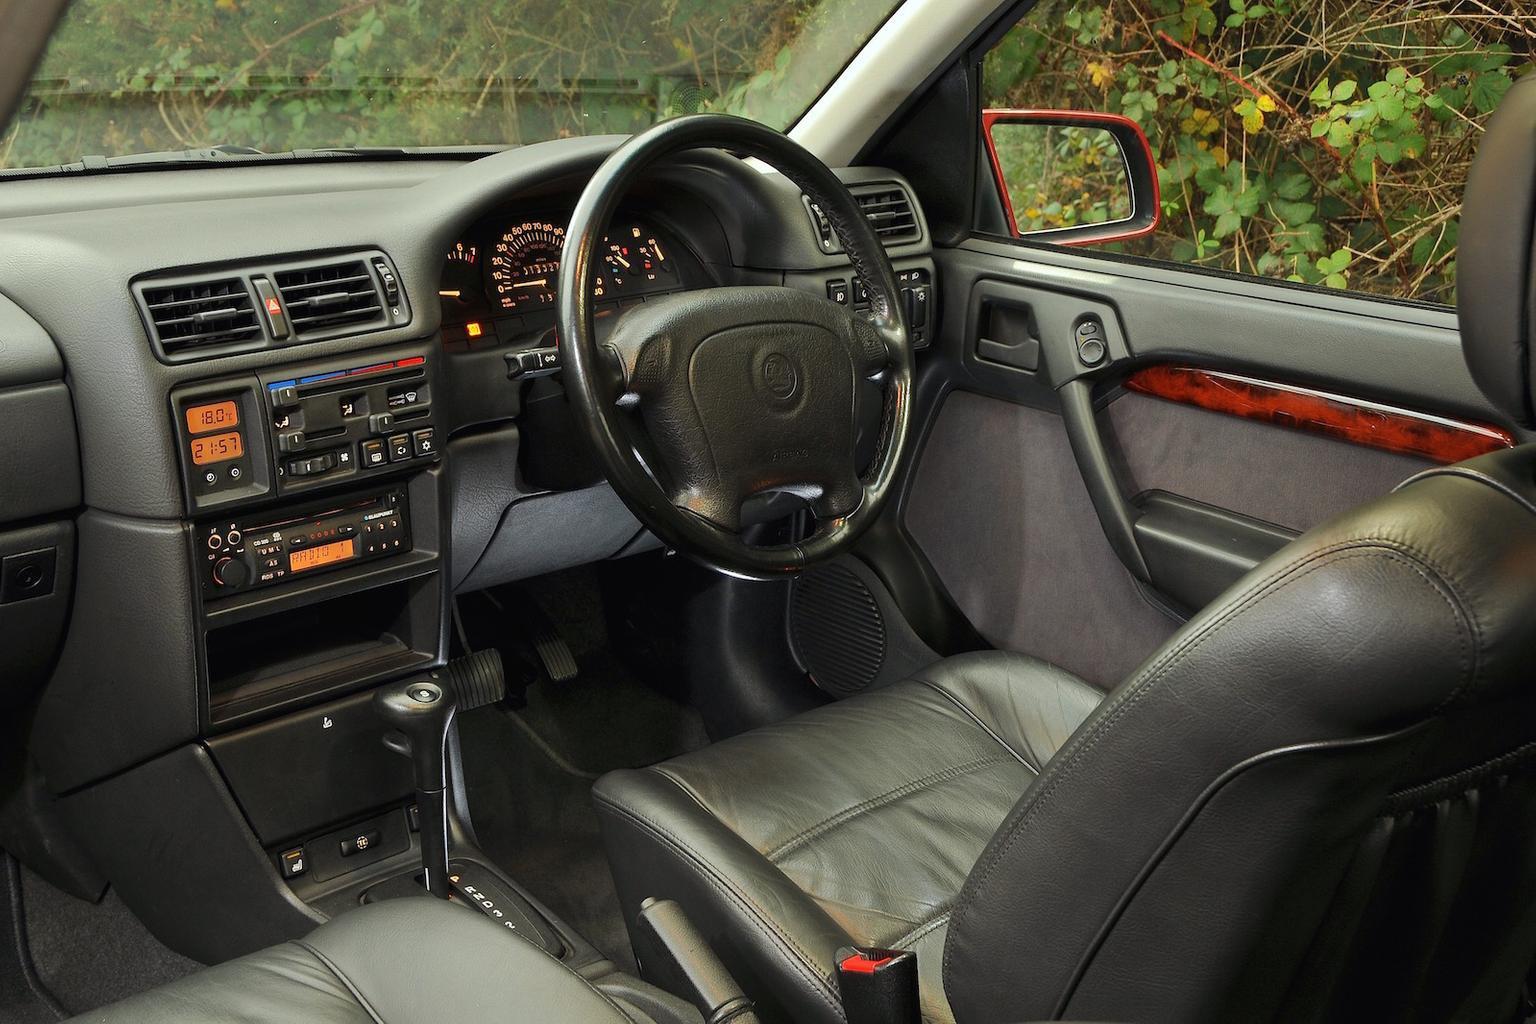 Vauxhall Cavalier – Rewind Wednesday